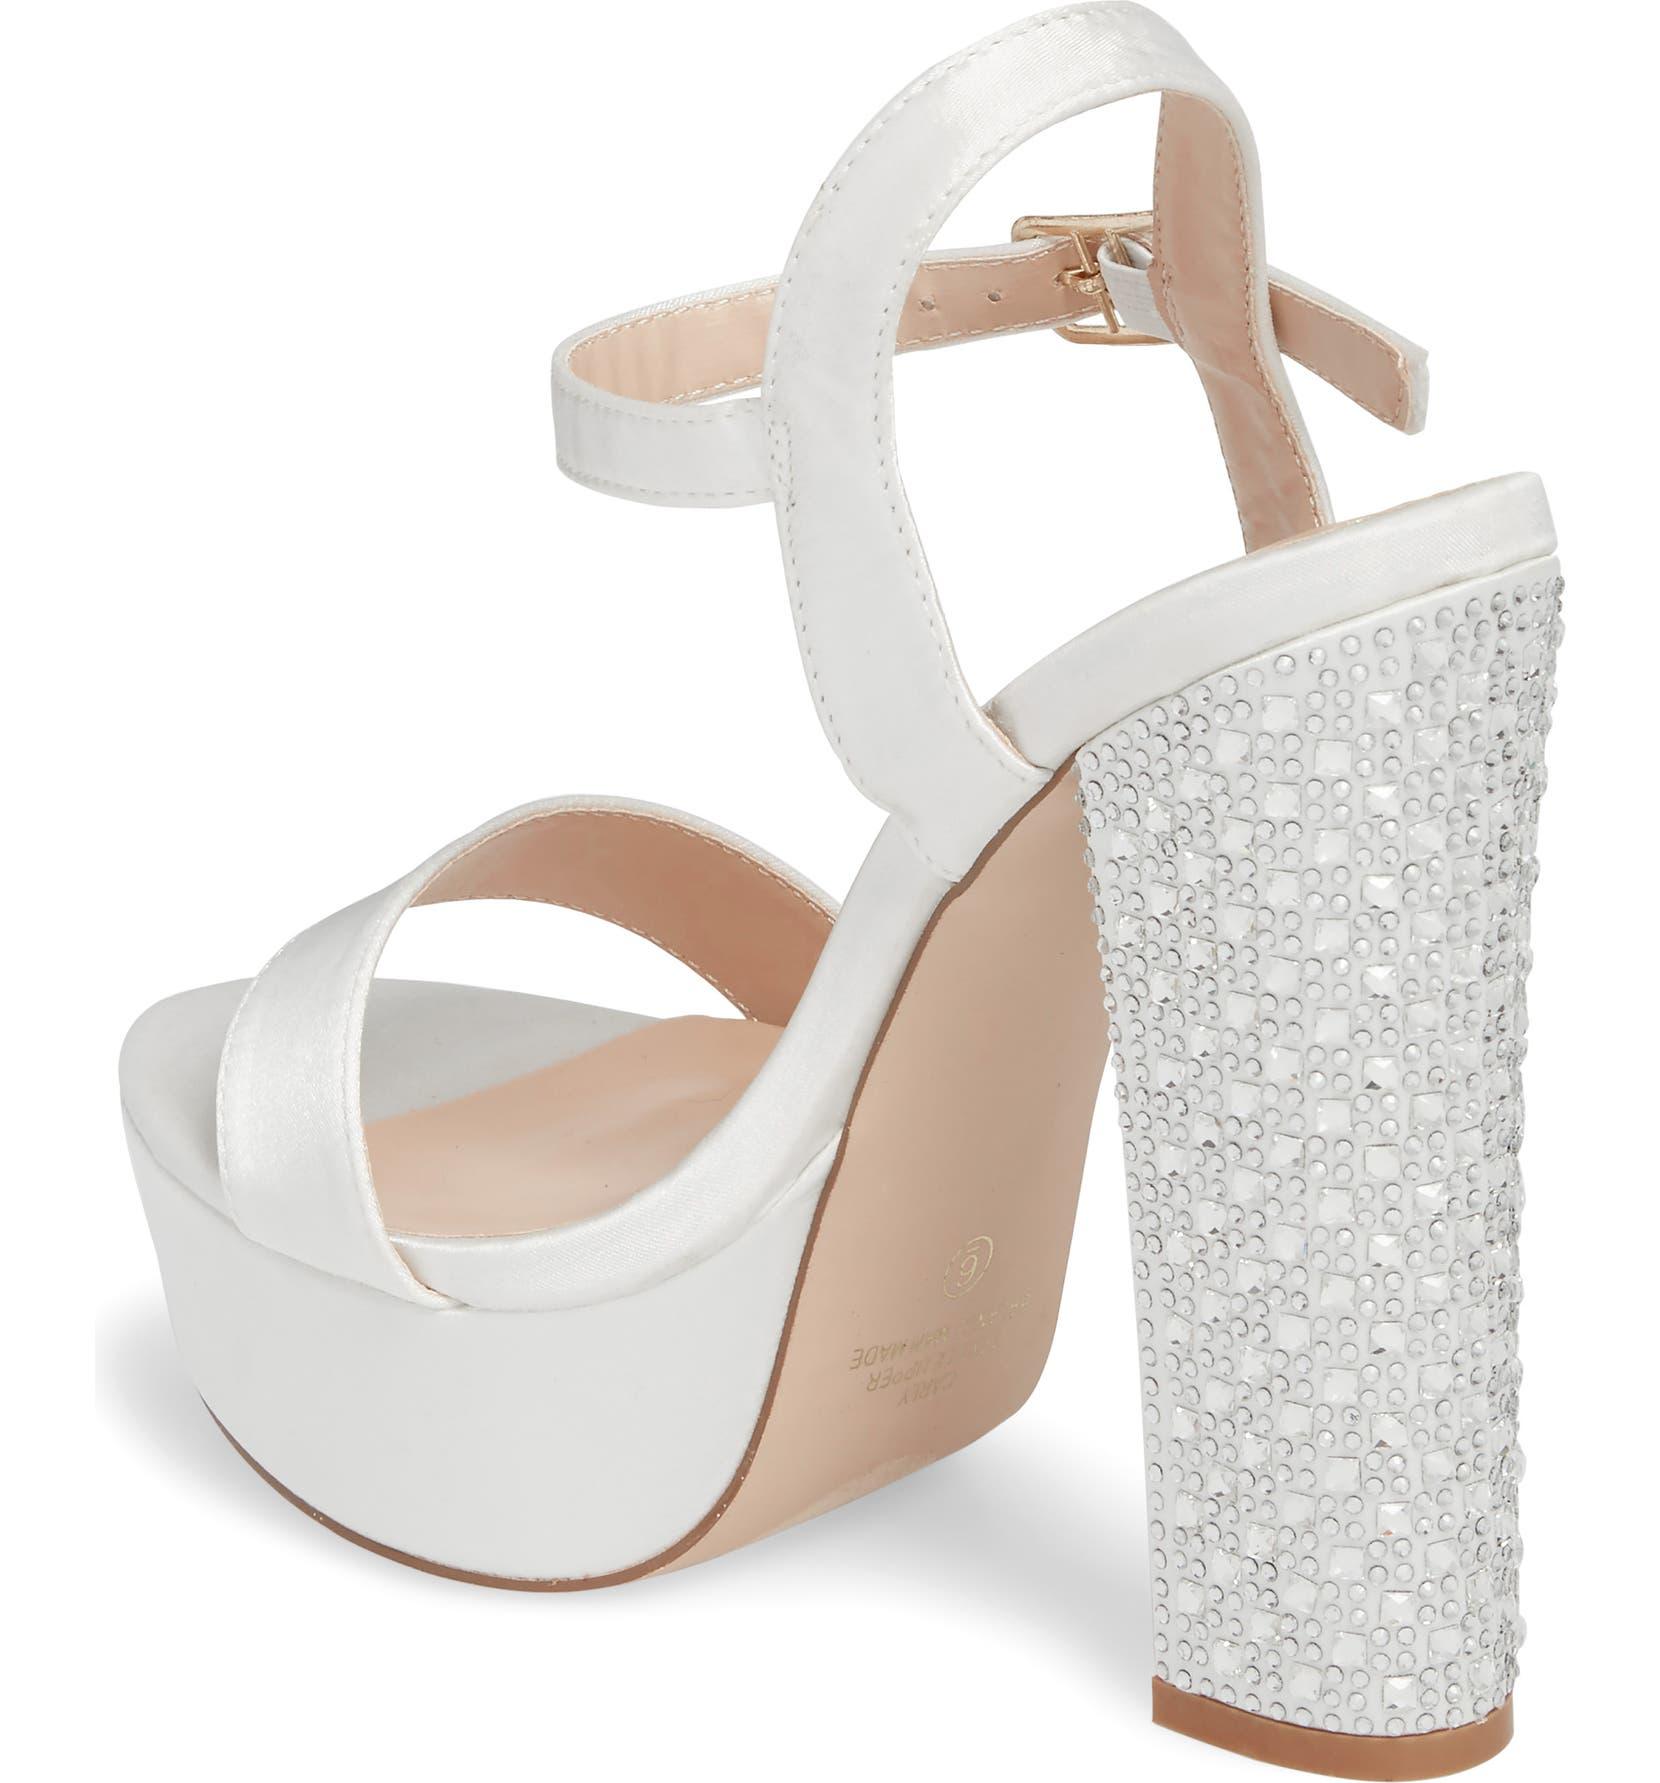 57318e81a89 Lauren Lorraine Carly Platform Sandal (Women)